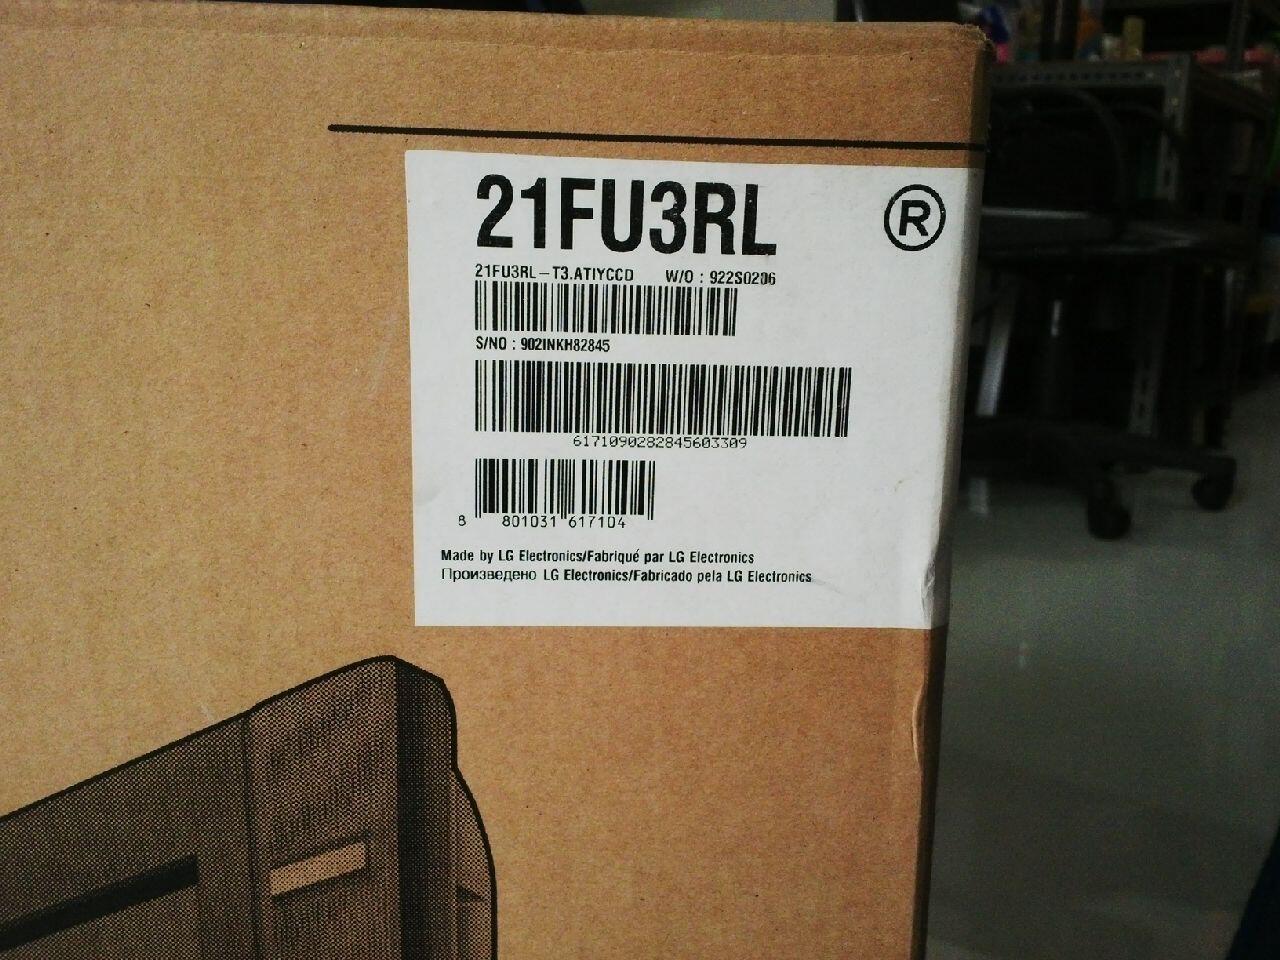 TV LG pearl black 21FY3RL